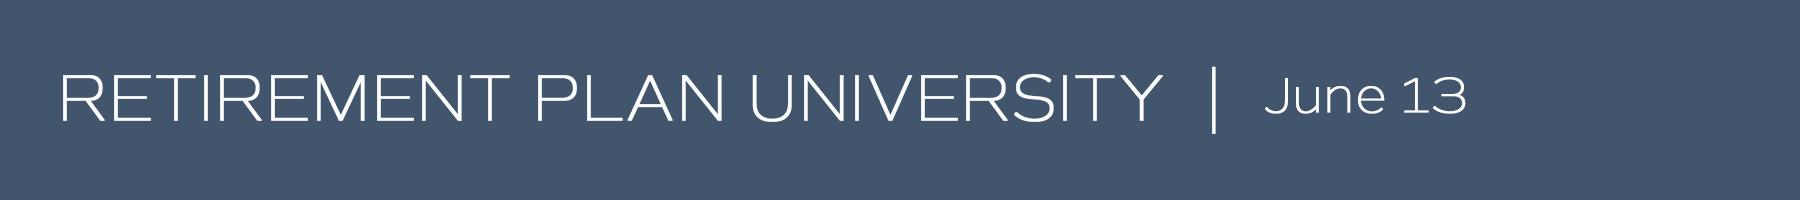 WEBSITE BANNER-Retirement Plan University.png